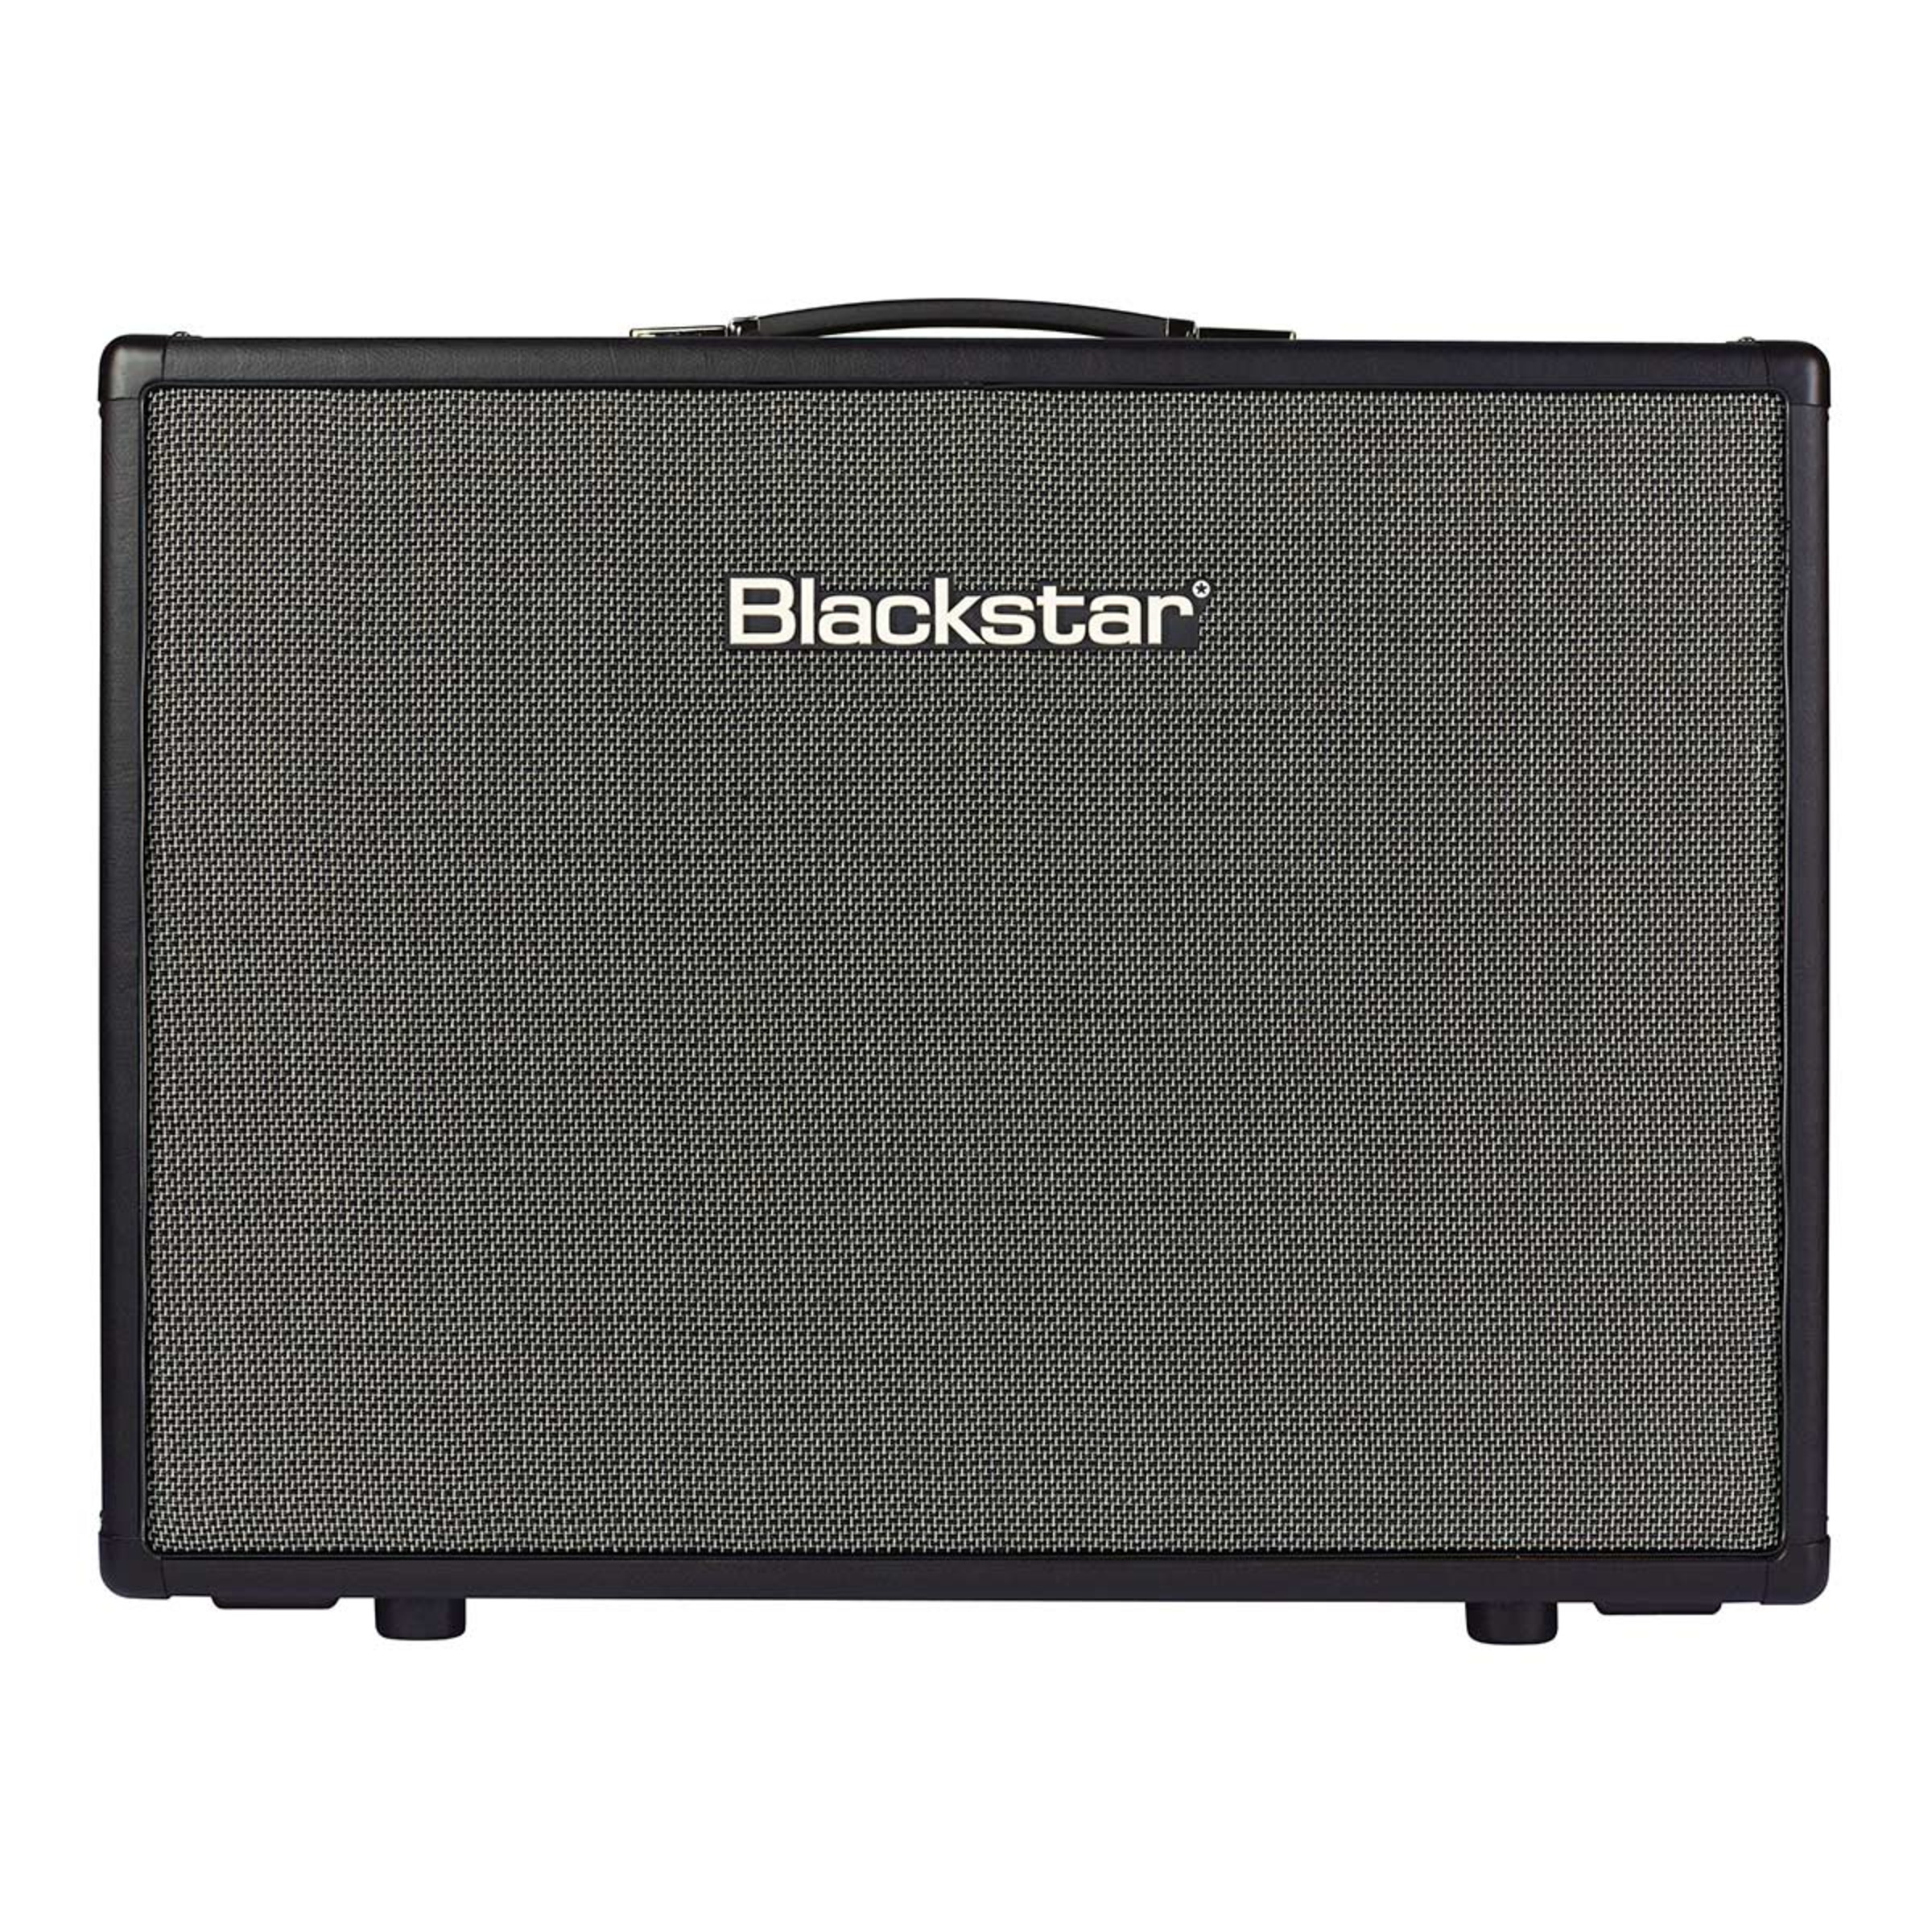 blackstar htv212 mkii 2x12 guitar cab giggear. Black Bedroom Furniture Sets. Home Design Ideas